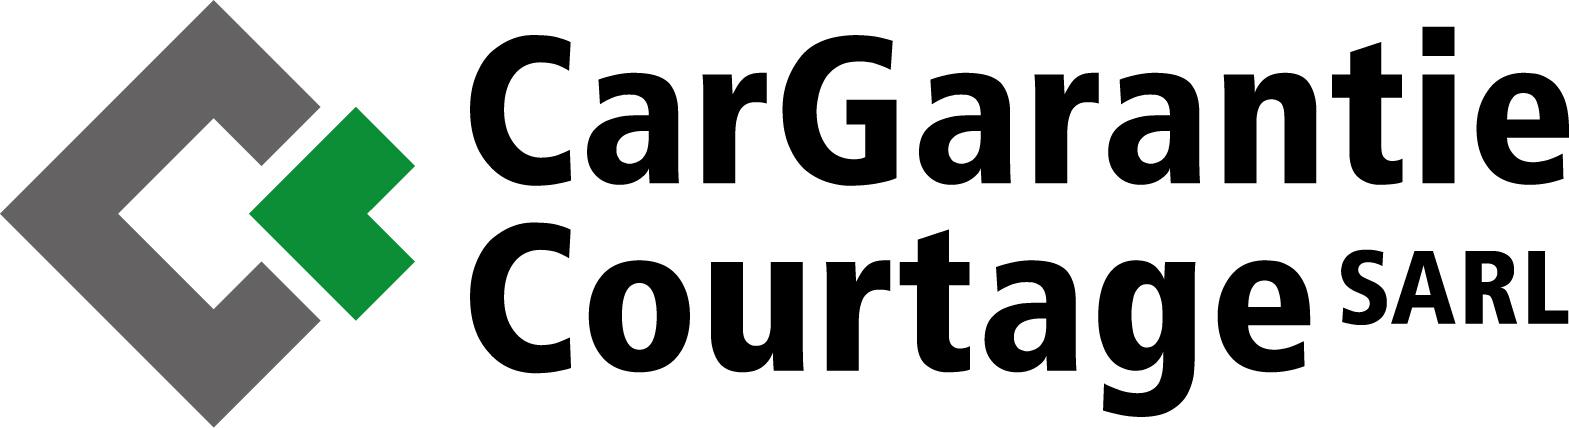 logo cargarantie courtage